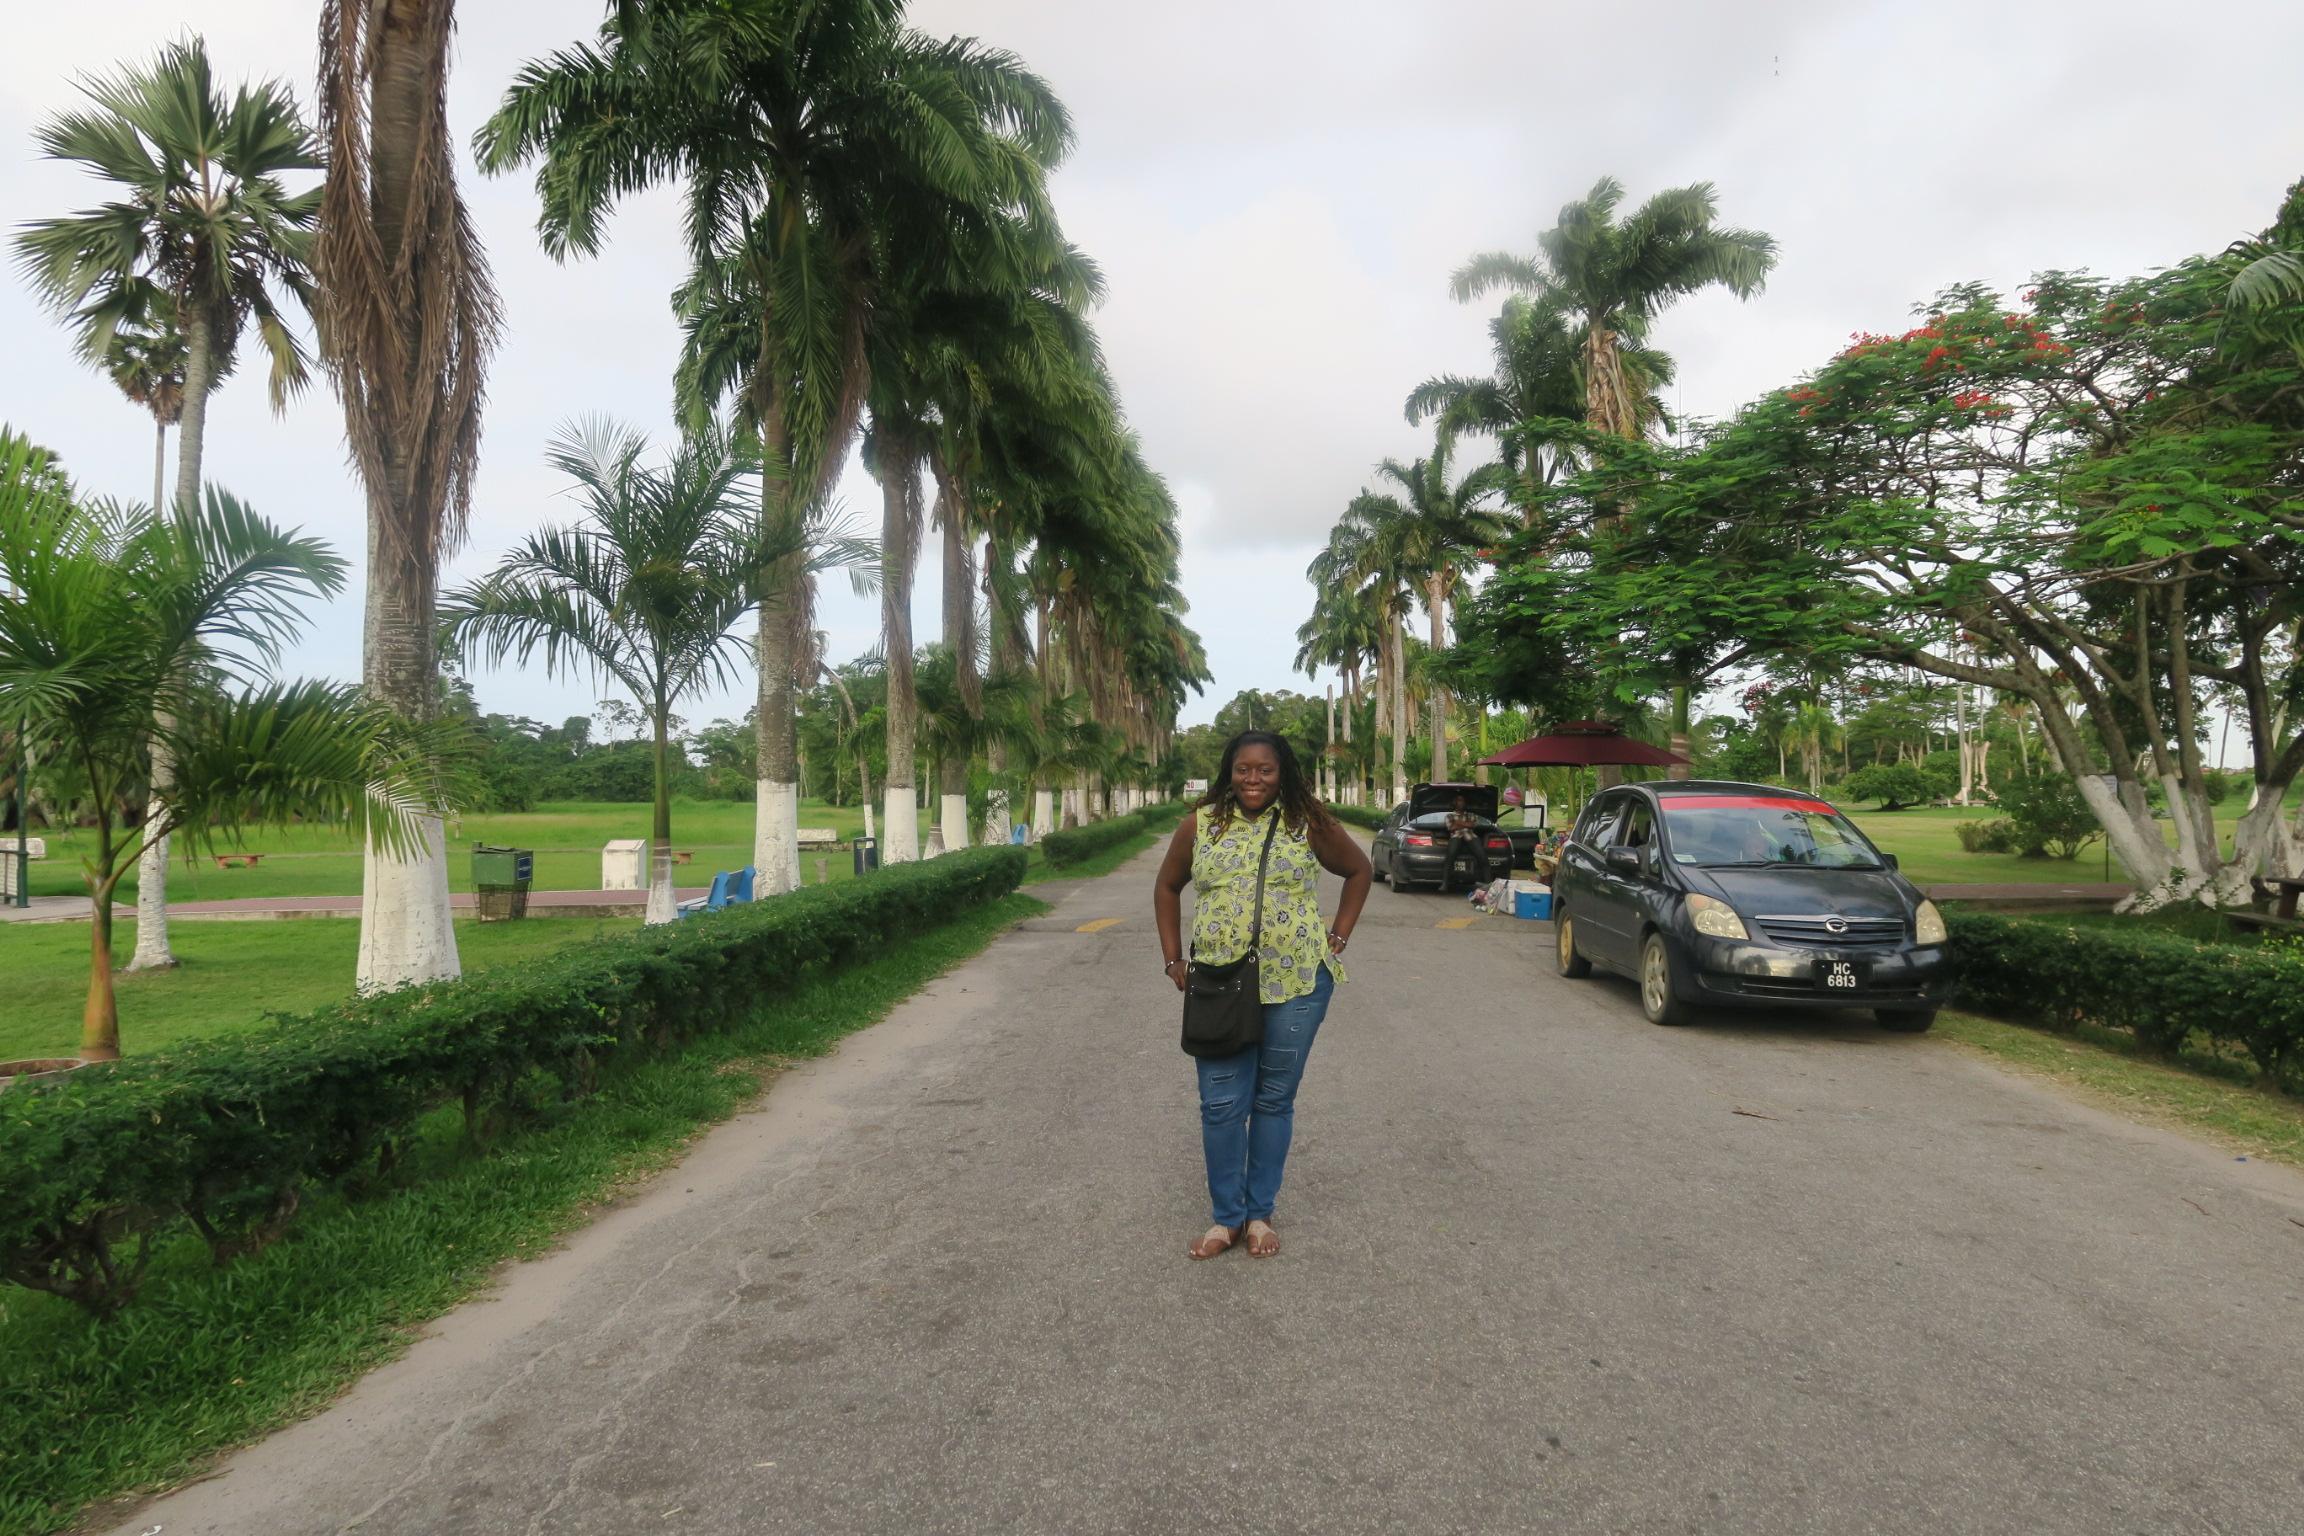 At the Botanical Gardens in Guyana